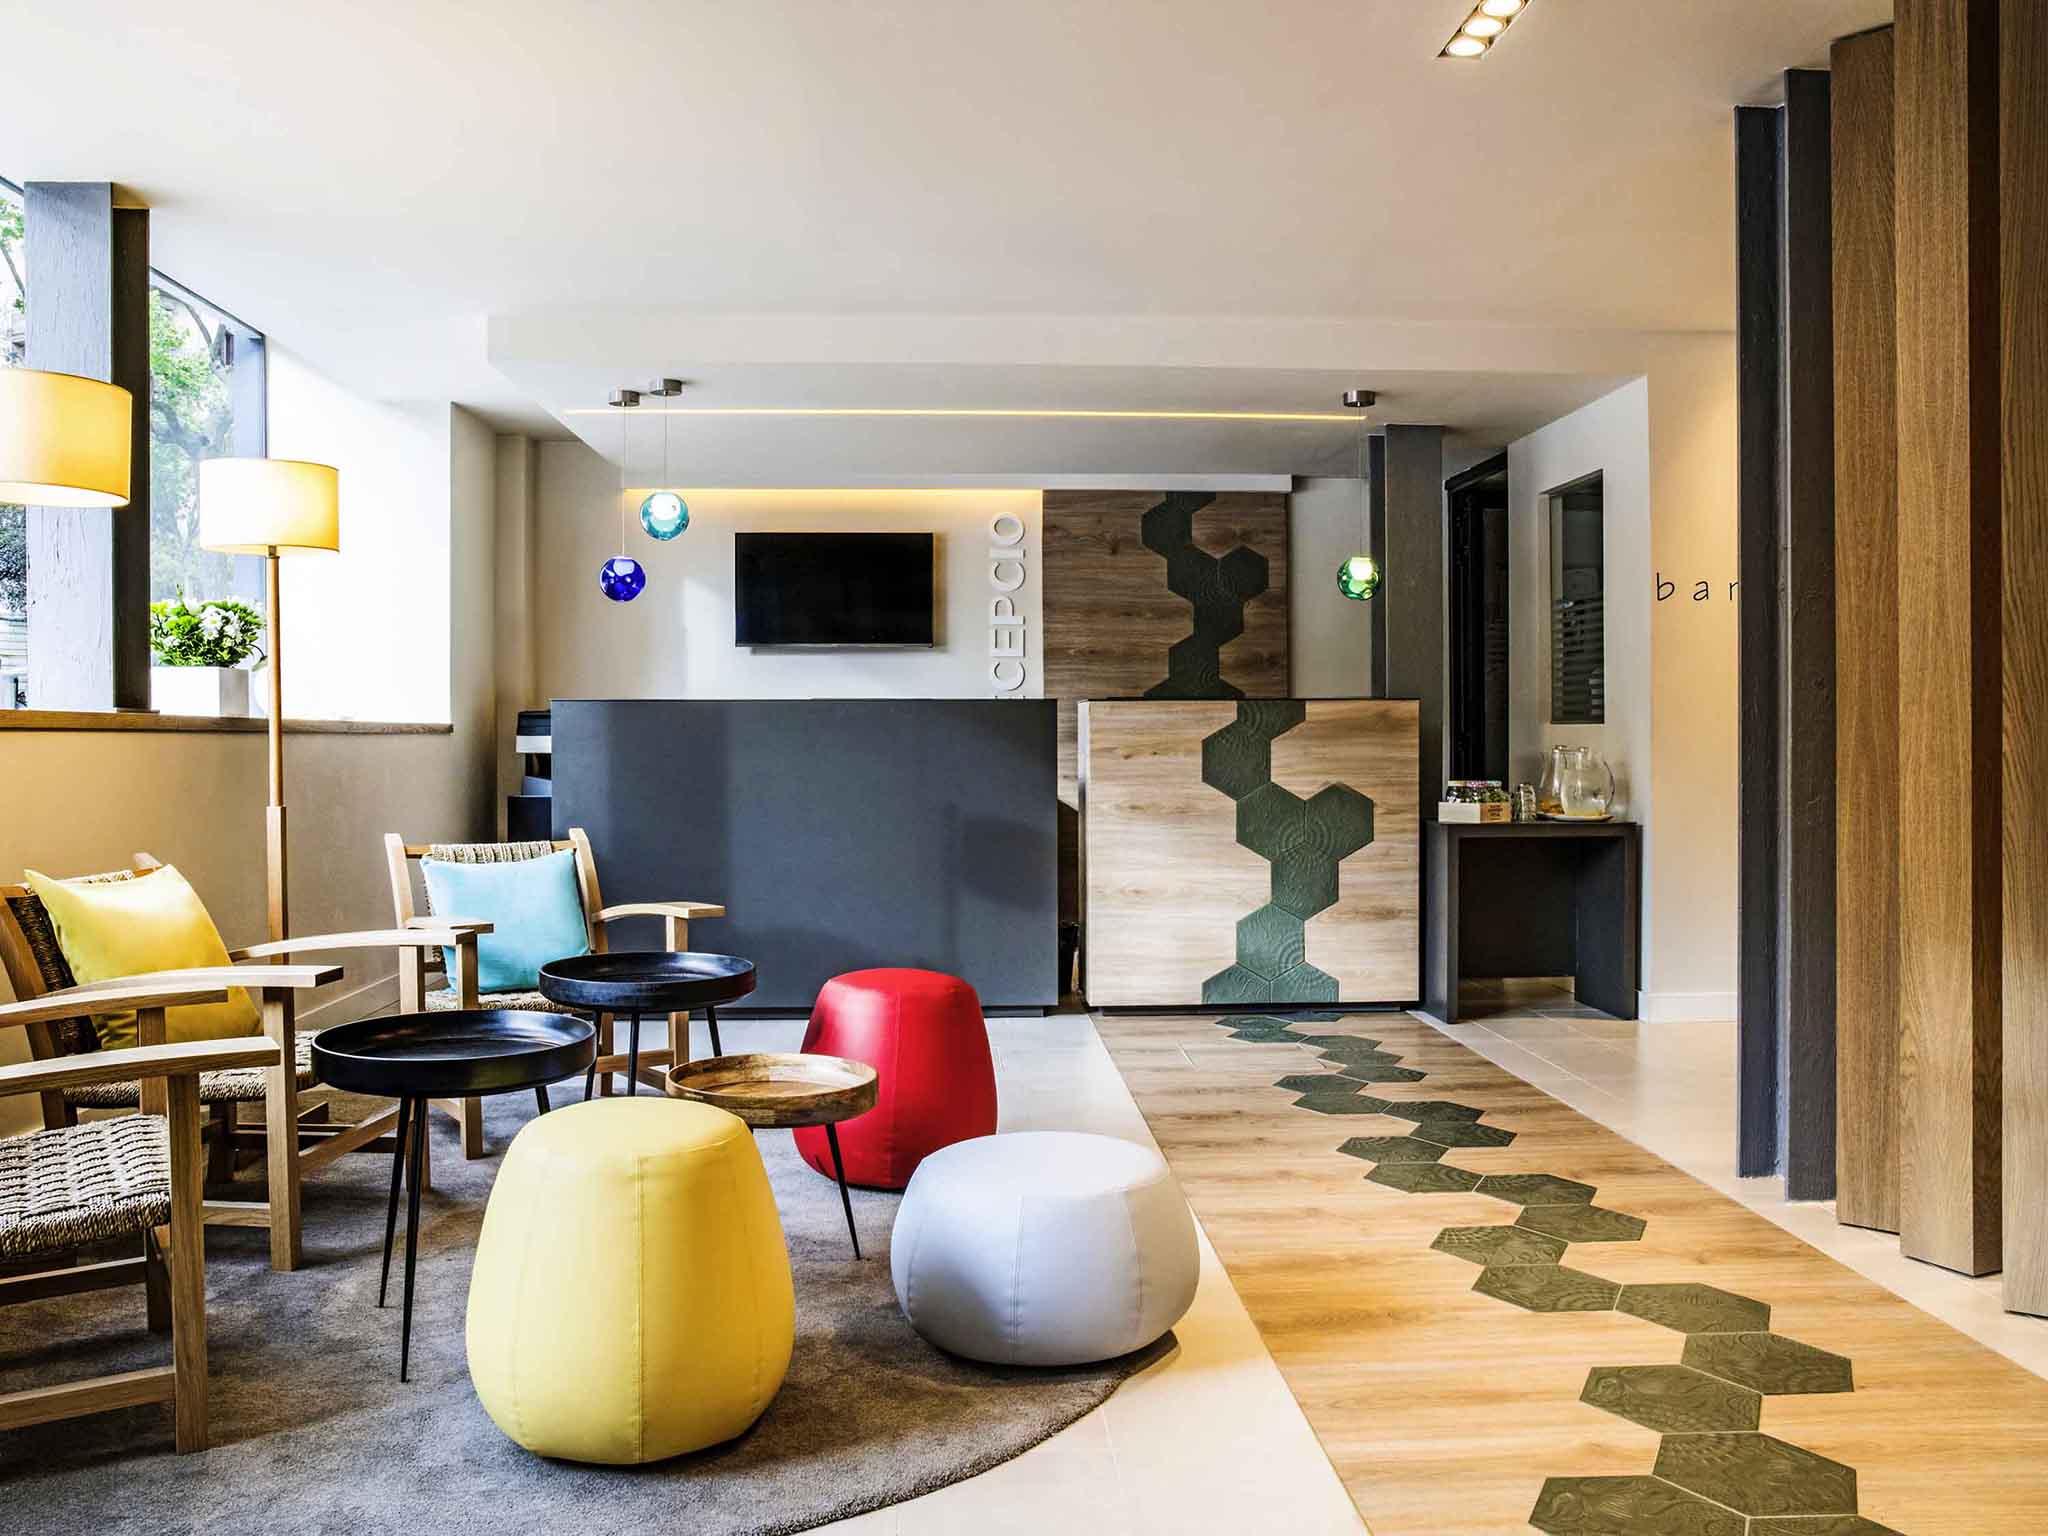 Hotel – Ibis Styles Barcelona Centre